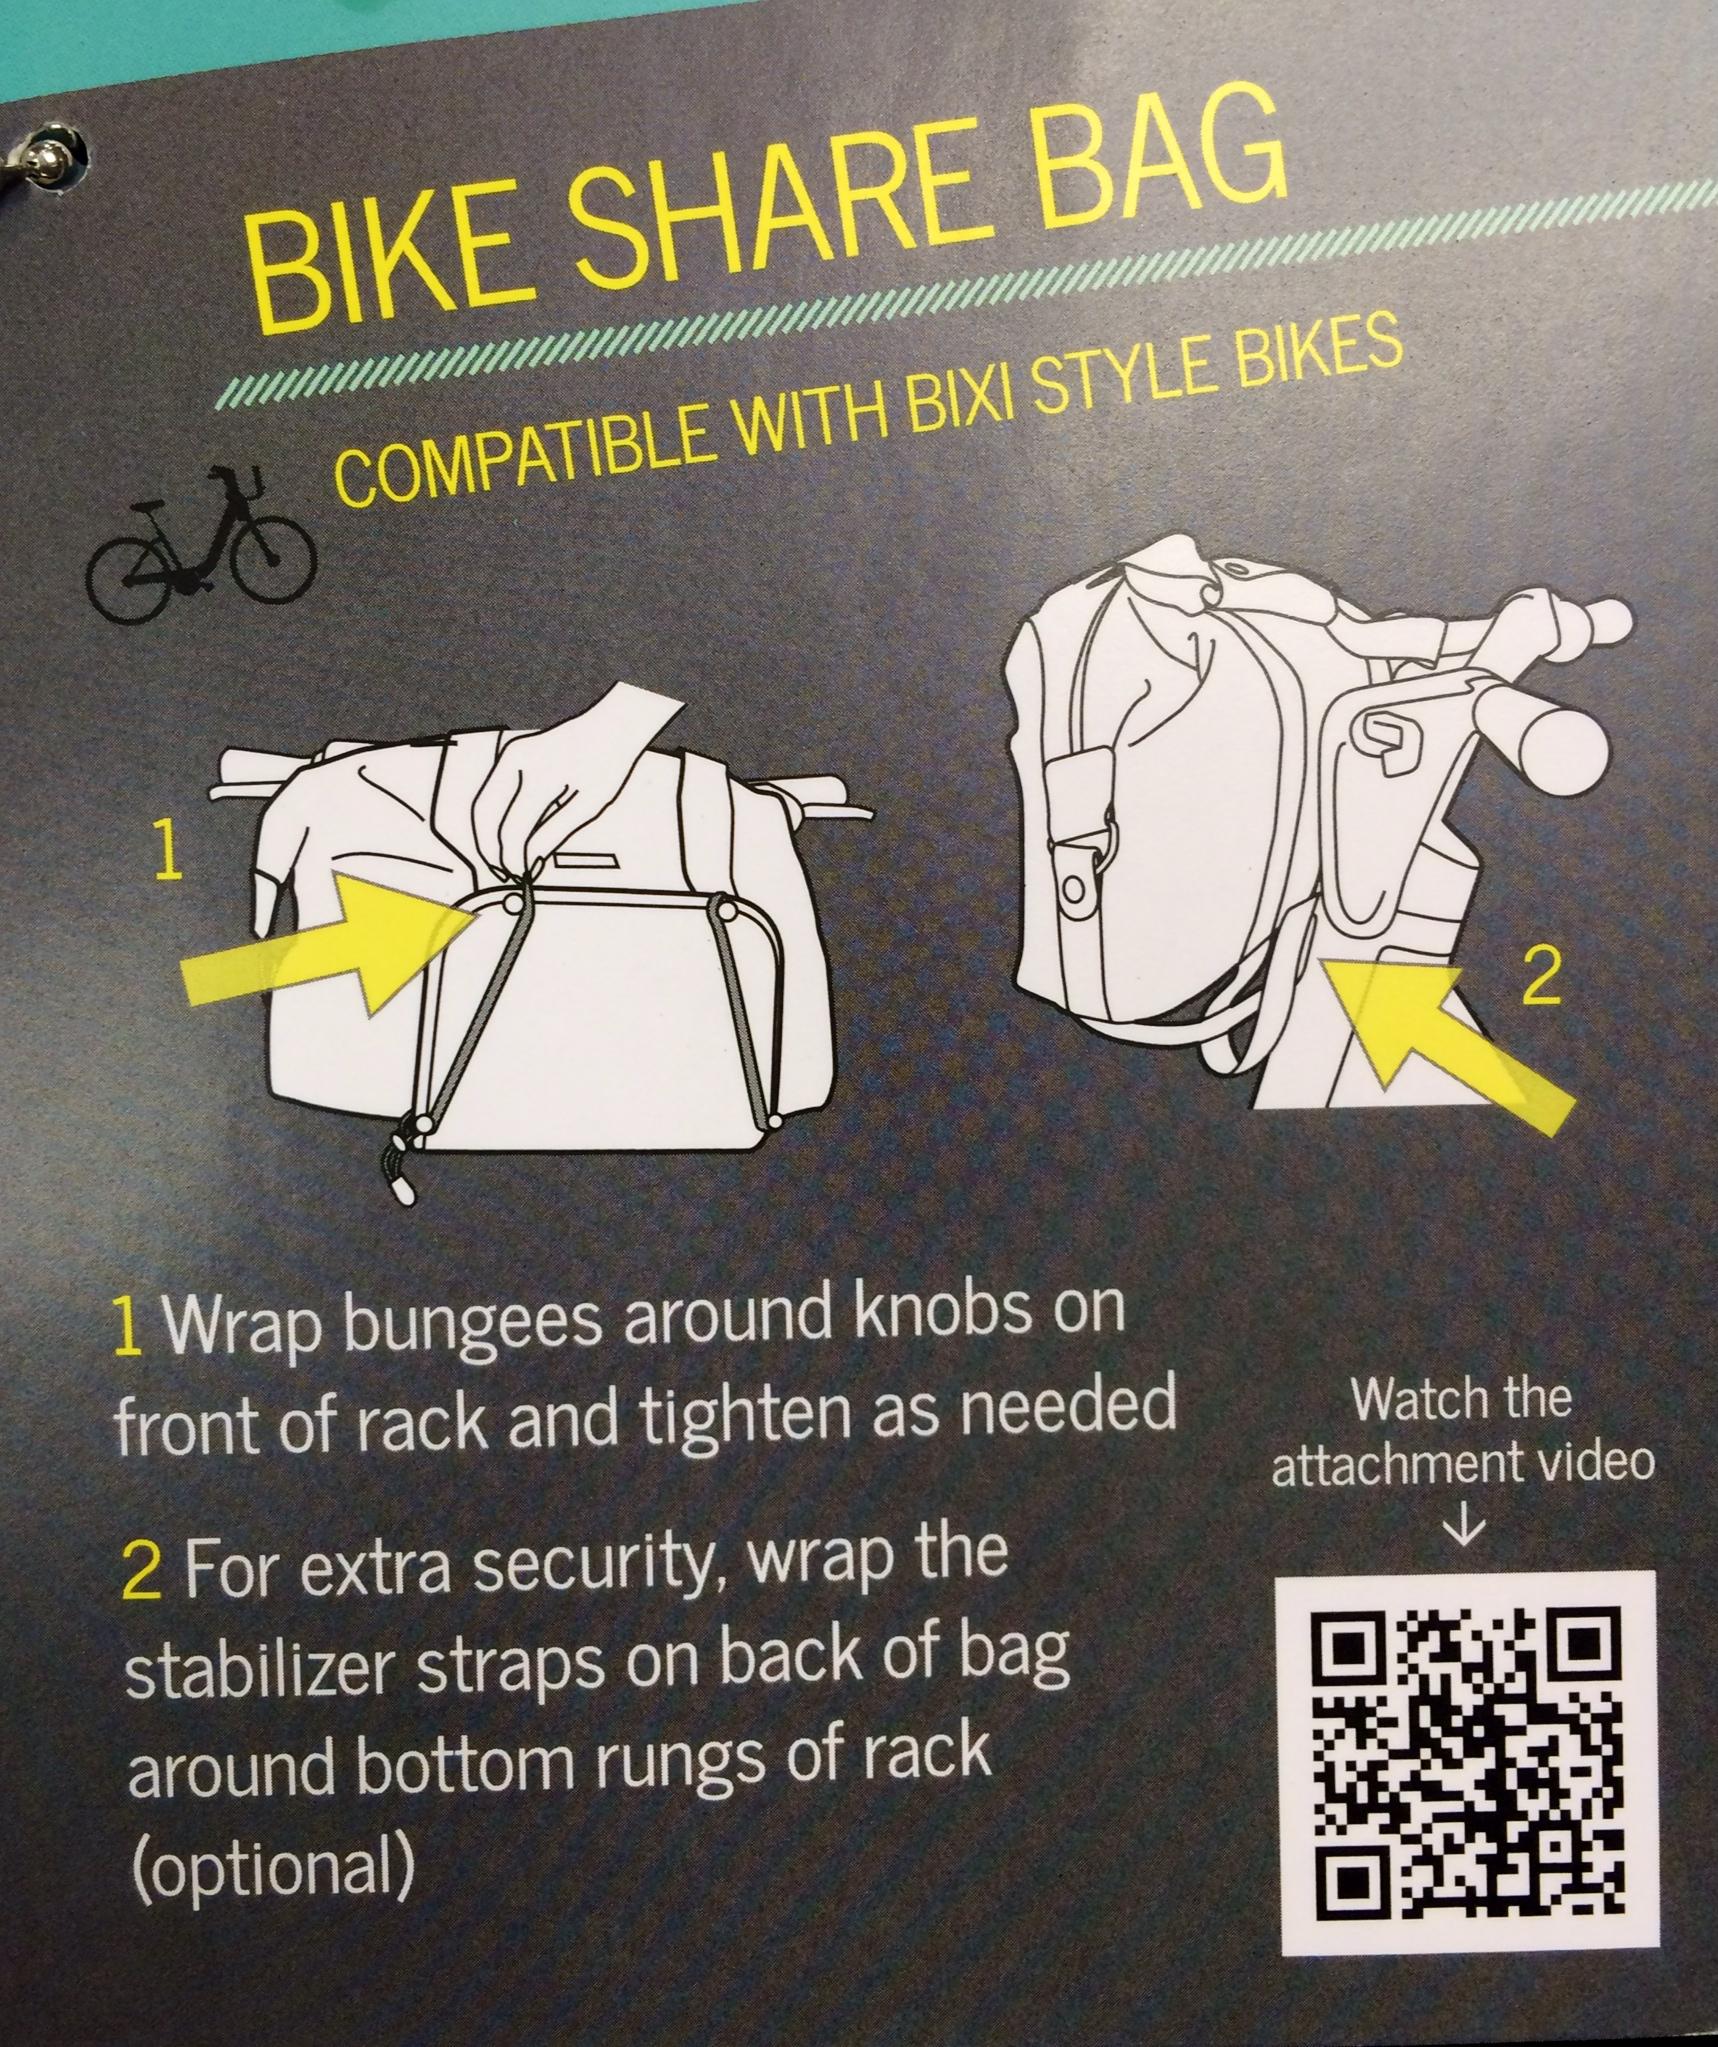 Divy Bike Share Bag the pro Po Campo bike bag